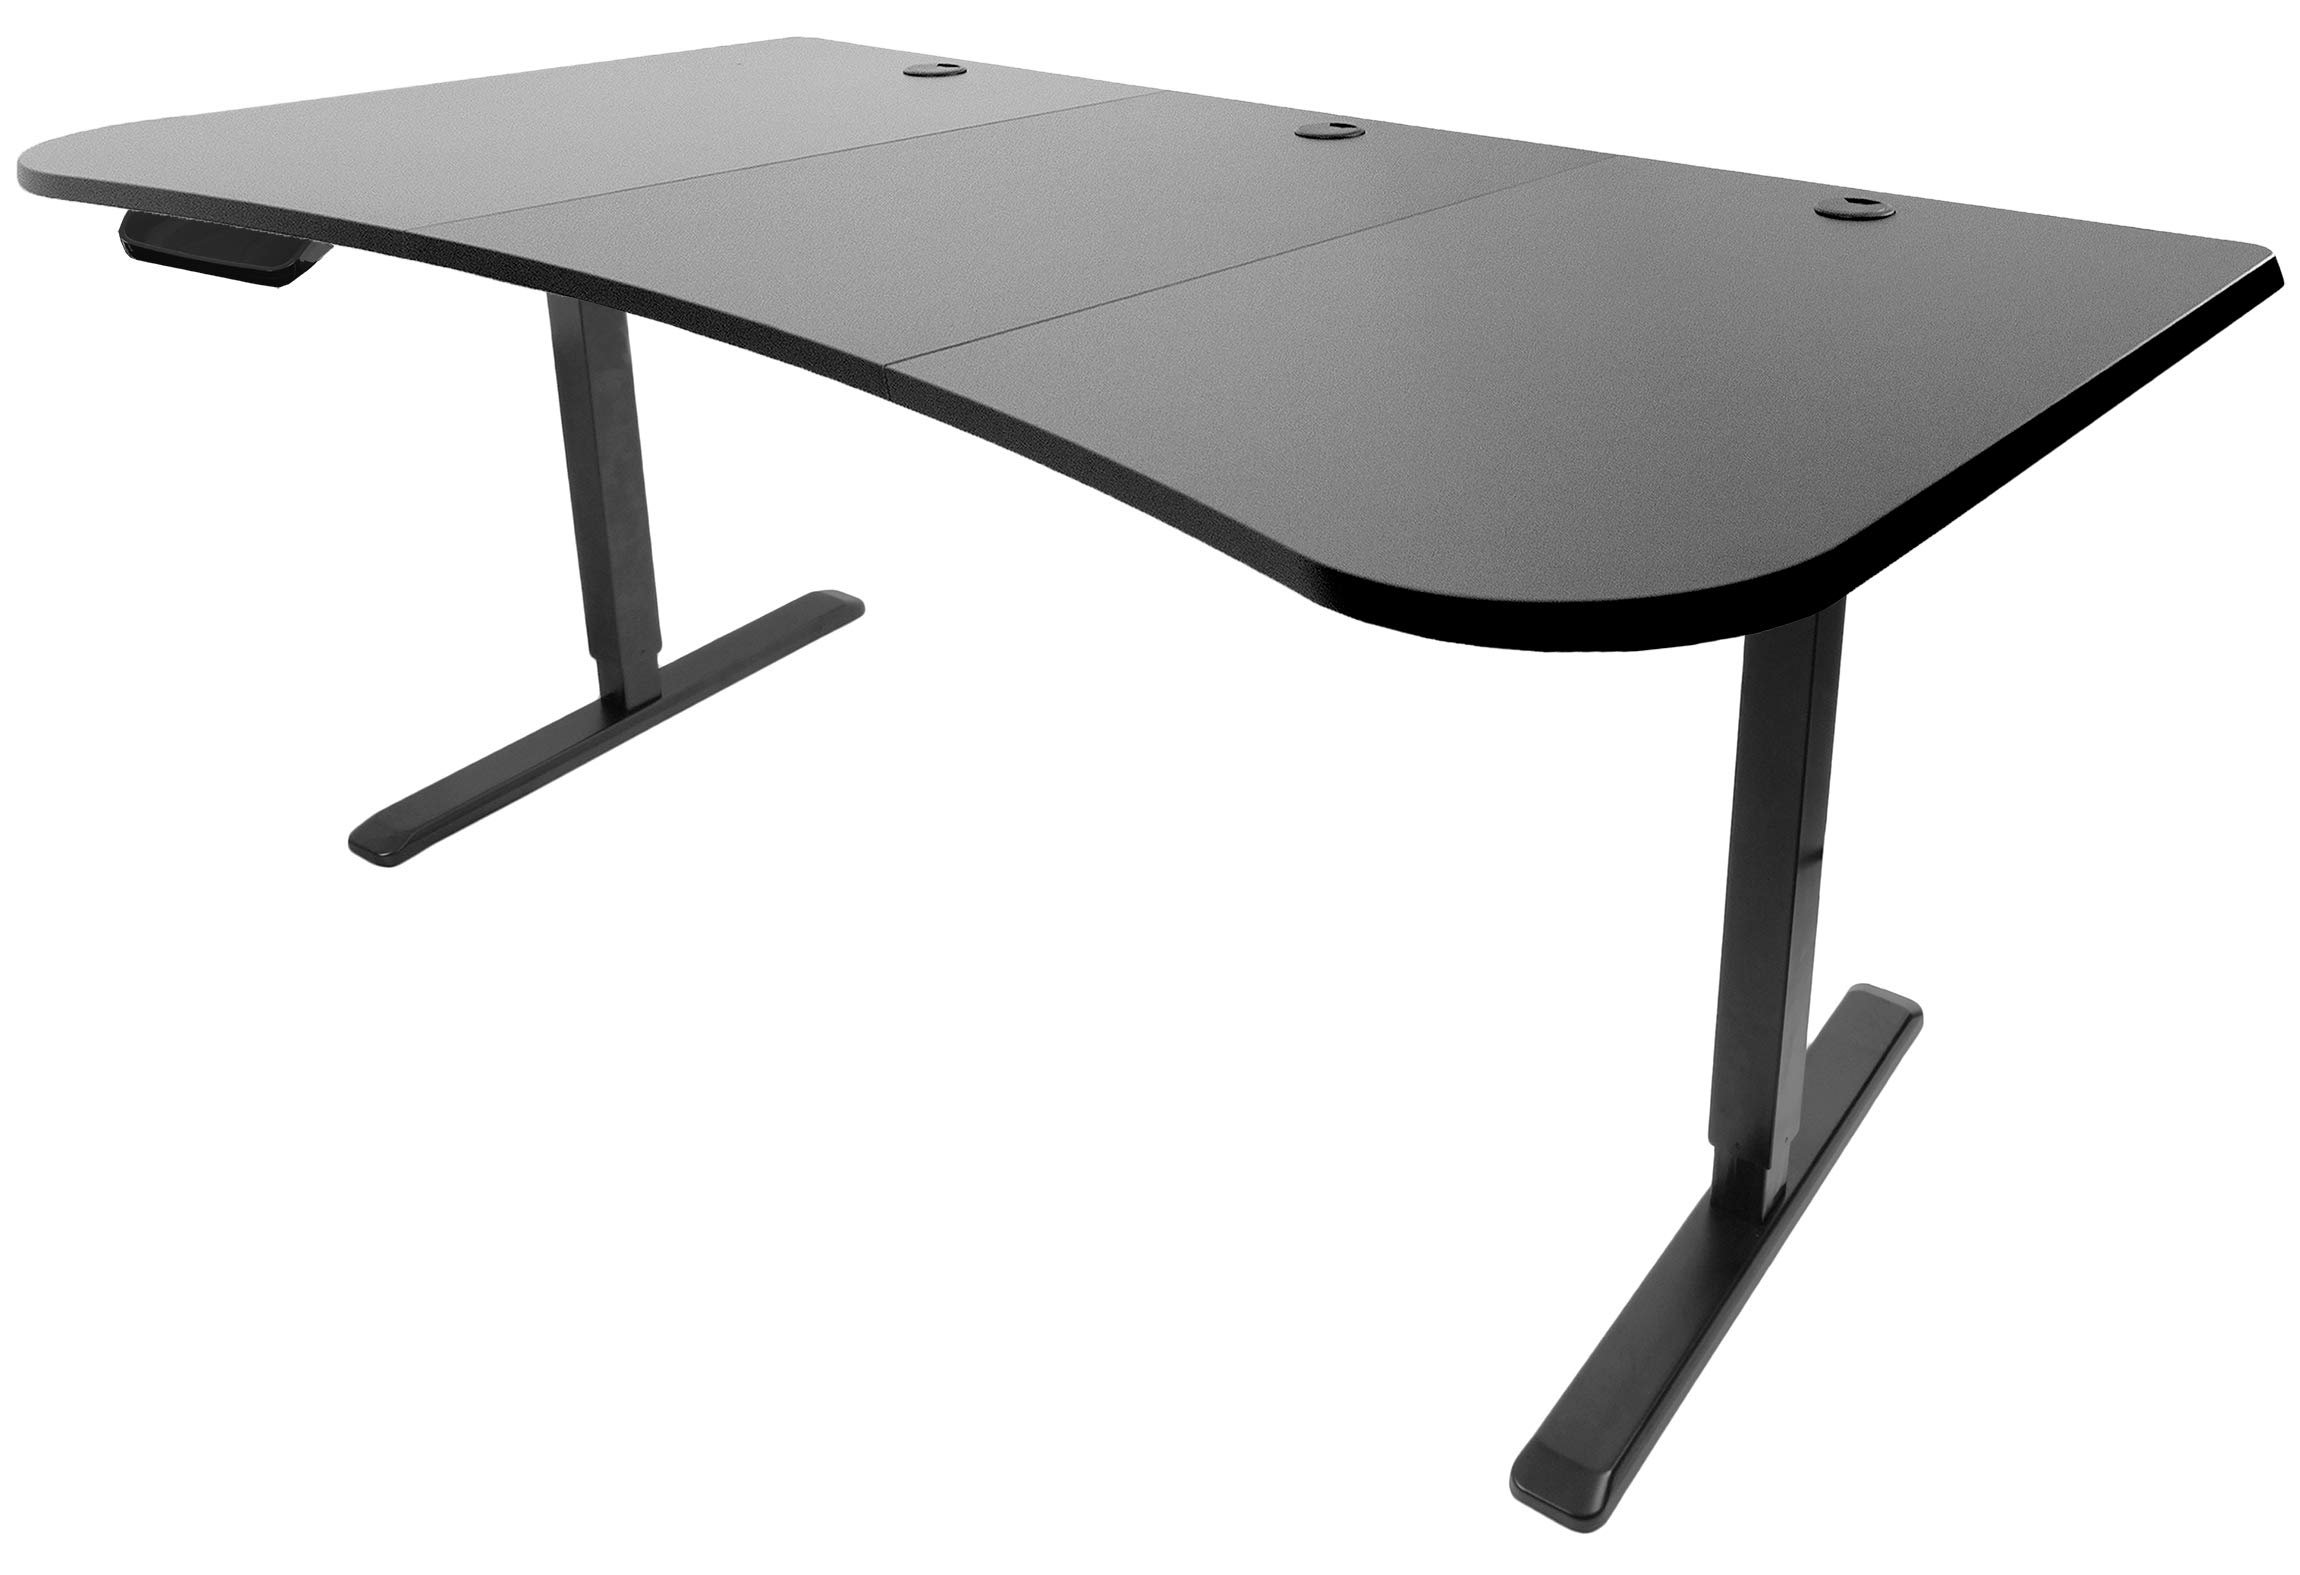 VIVO Black Electric Height Adjustable Stand Up Desk Frame Workstation with 60'' x 30'' Table Top and Memory Preset Controller   Frame & 60-inch Desktop Combo (DESK-KIT-2E1B)